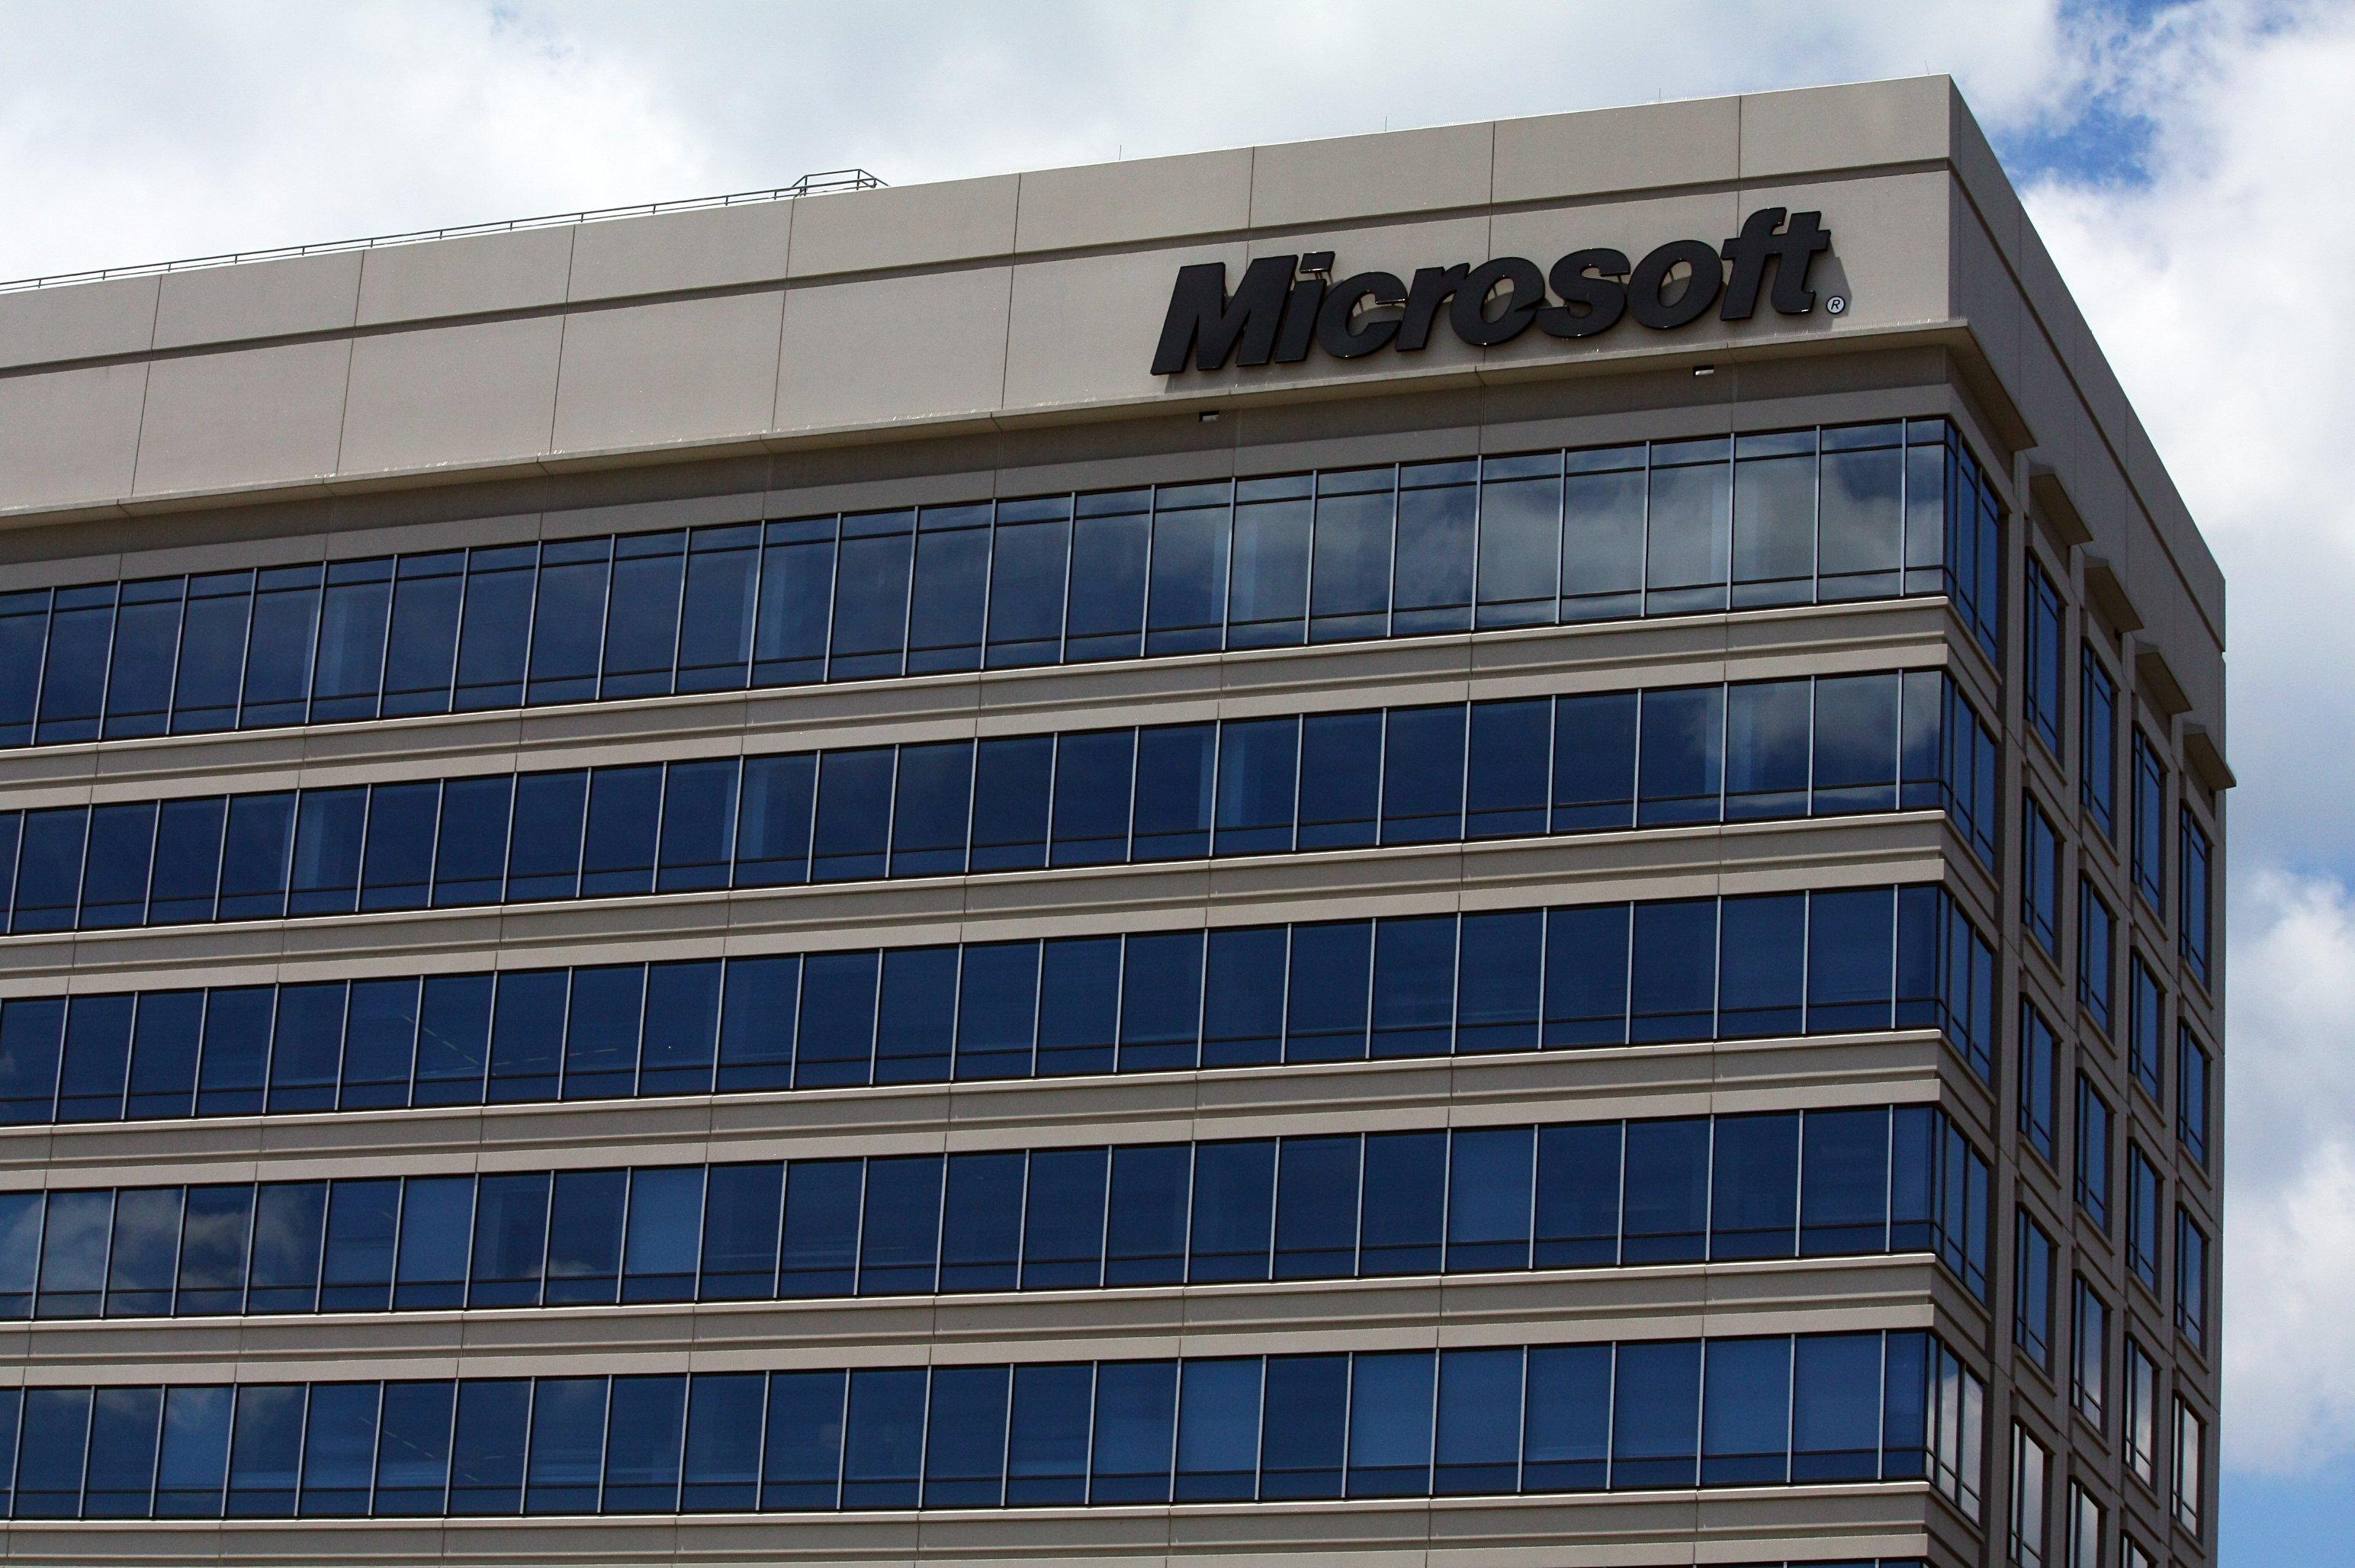 Microsoft won't hit Windows 10 '1 billion' deadline